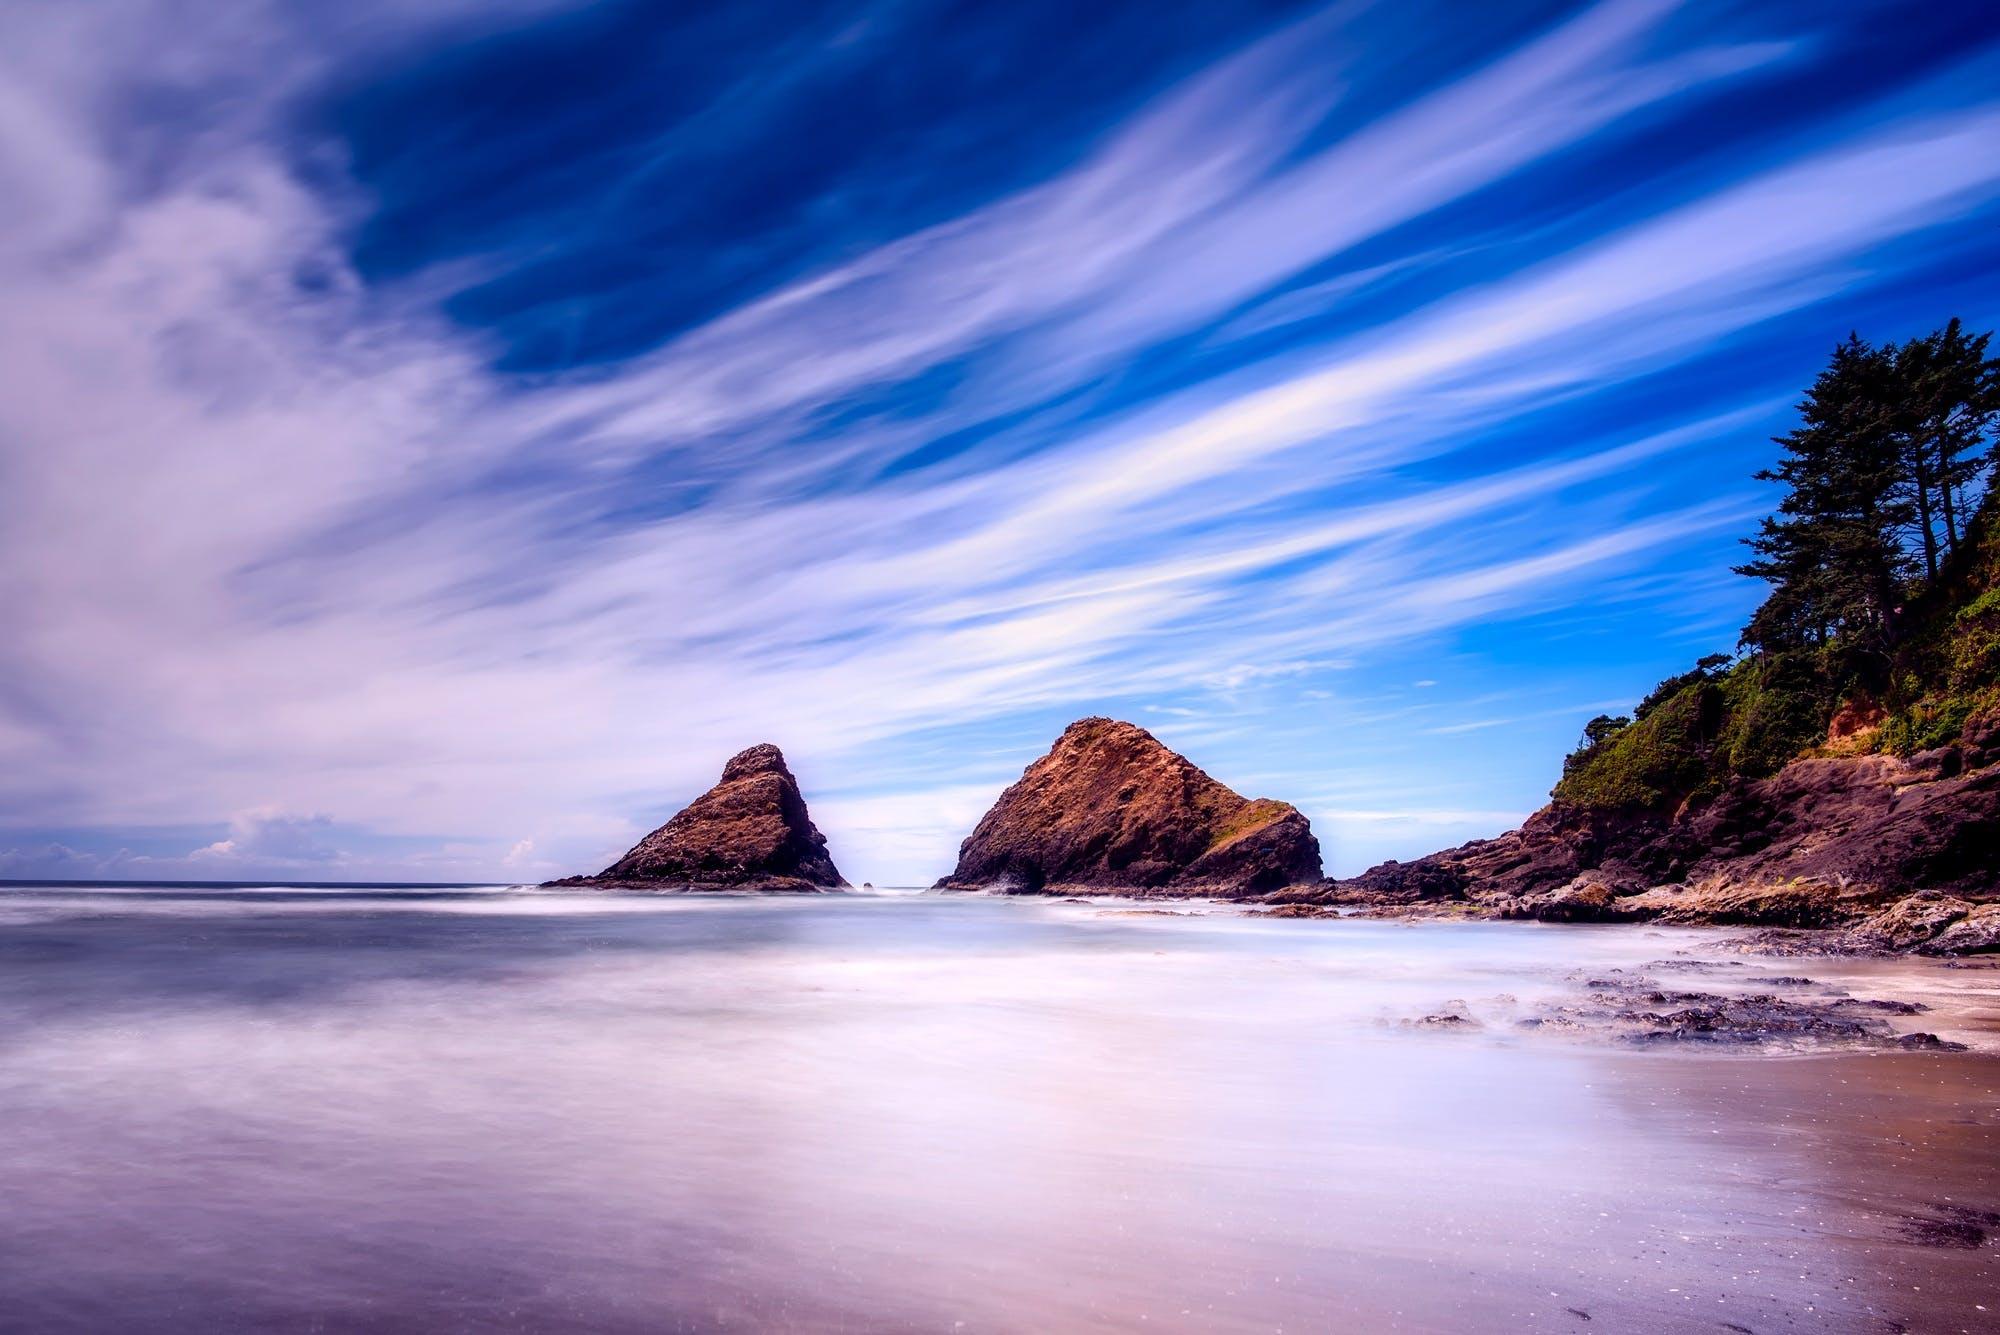 Time-lapse Photo of Seashore